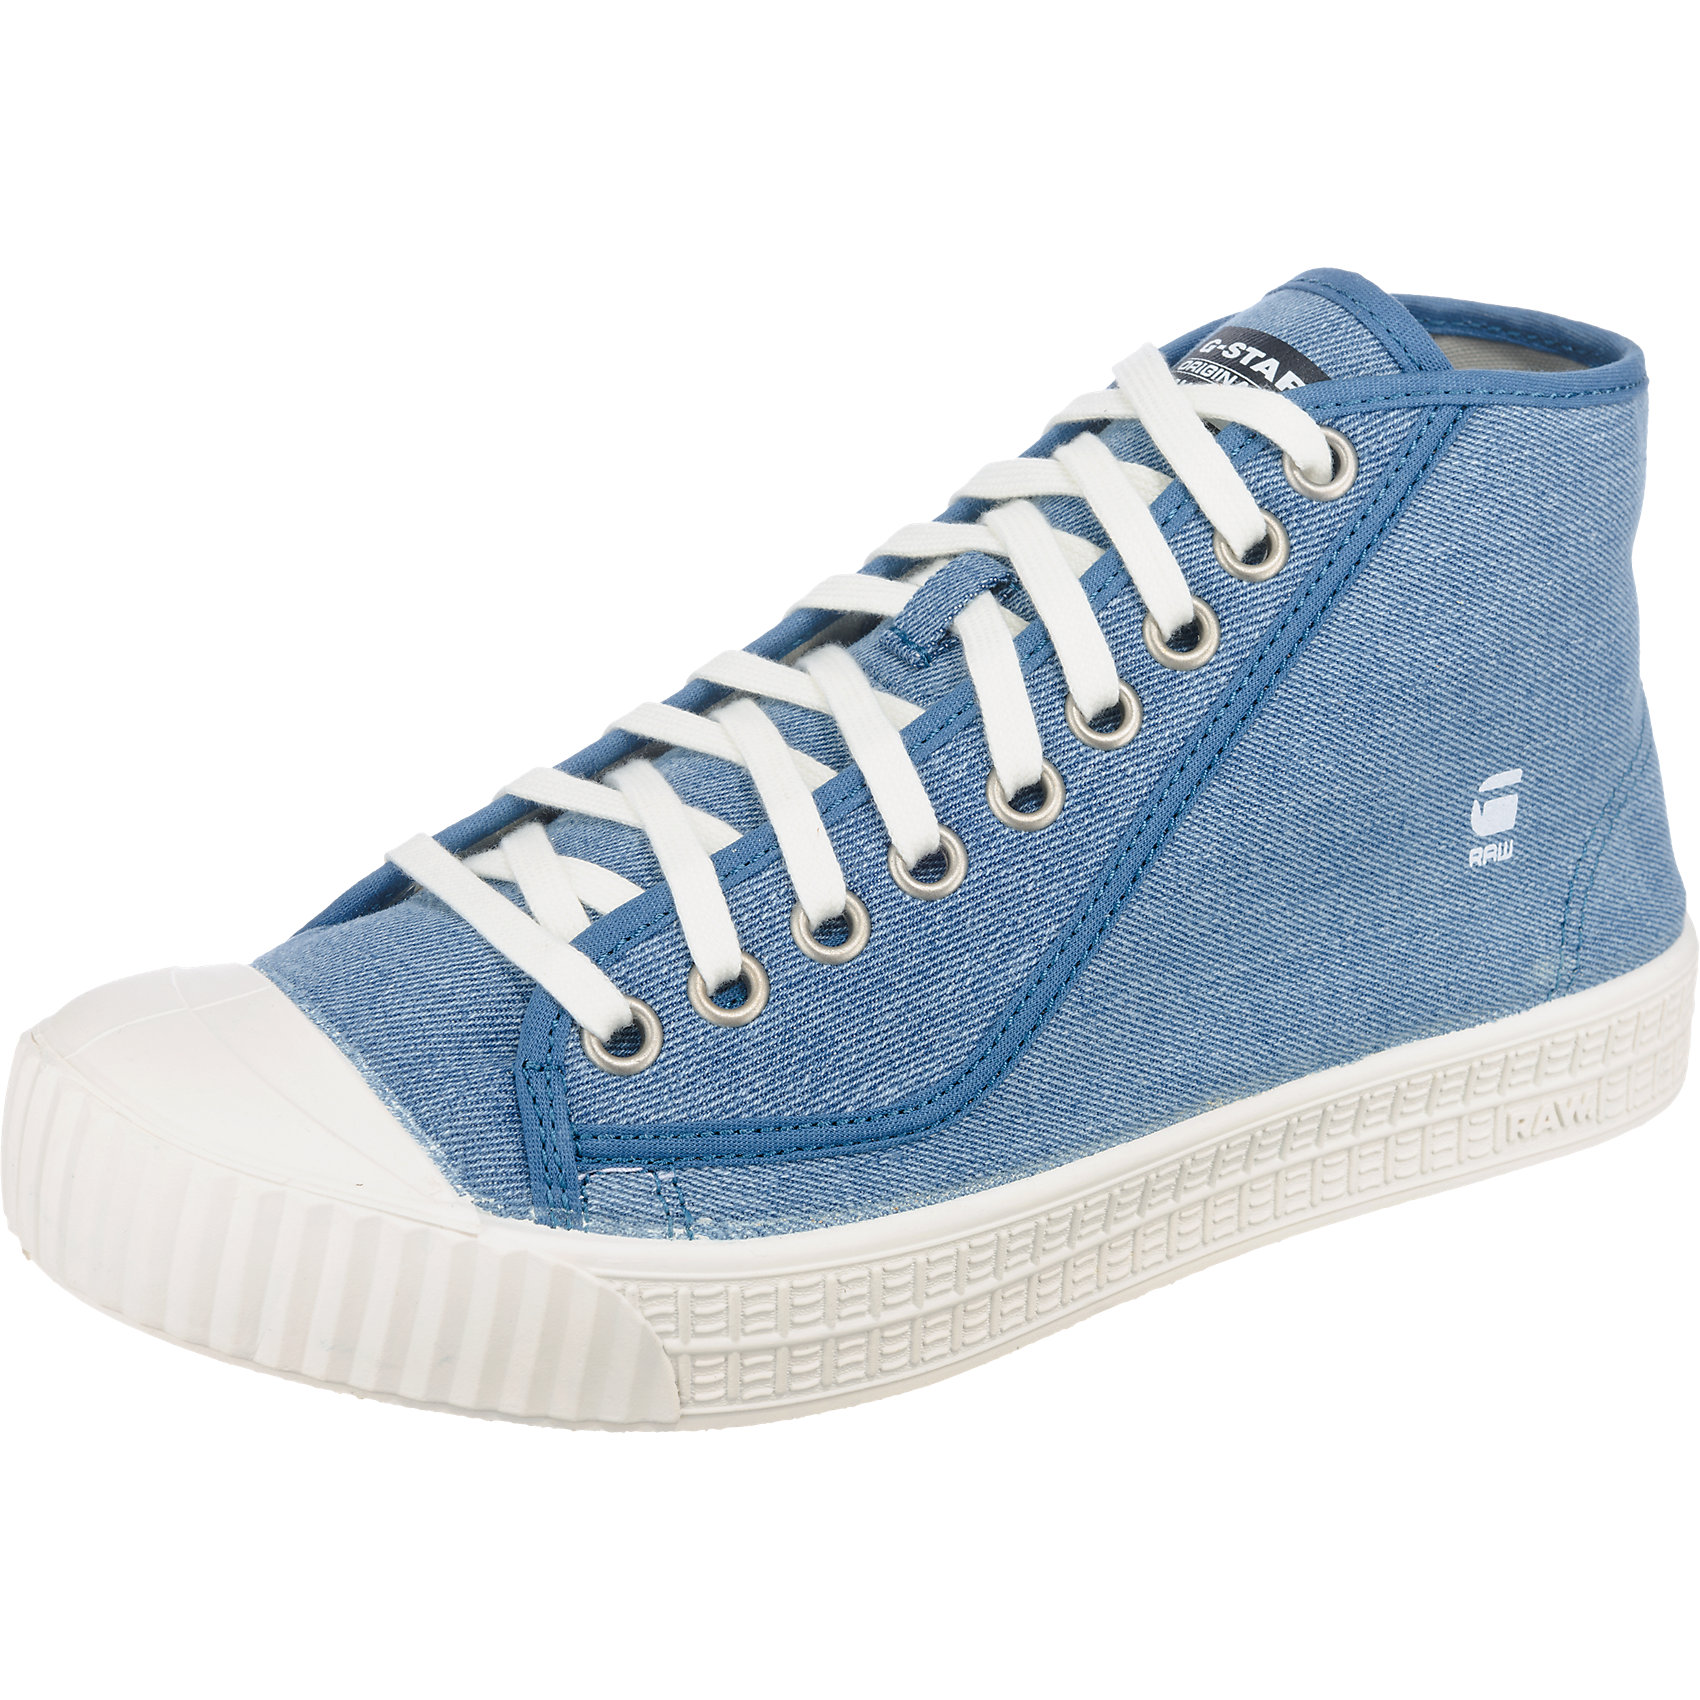 on sale 6d1c5 64238 ... Nike Zoom Fly Sp Sp Sp Size 10.5 Mens Breaking 2 Crimson White Sail  AJ9282- ...